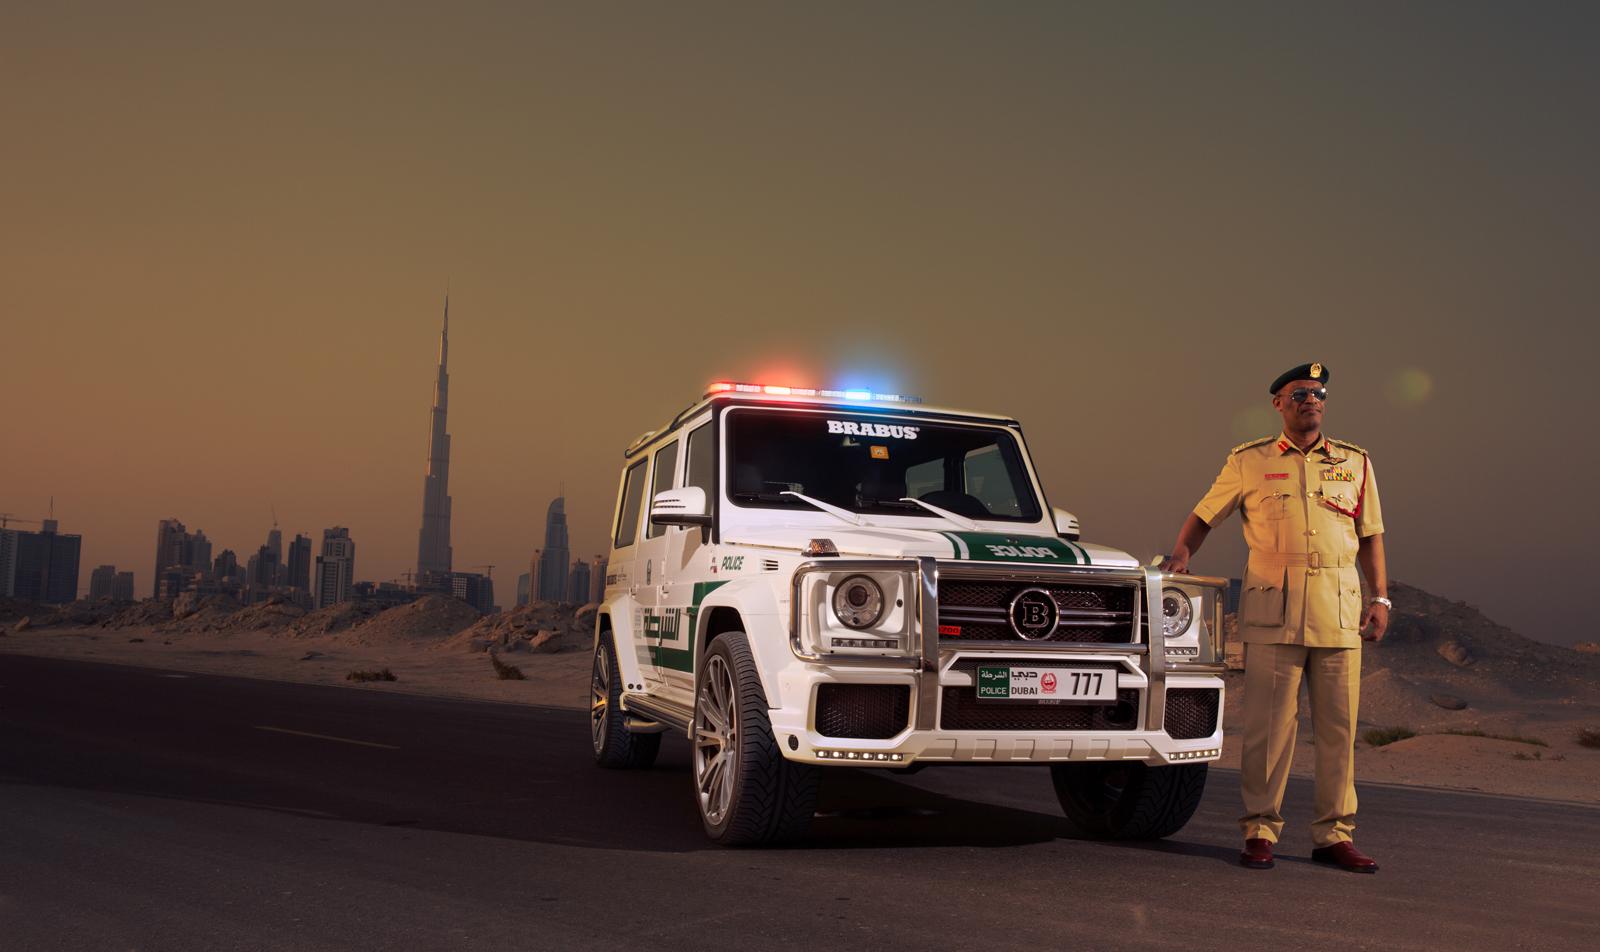 Brabus onthult de G 63 AMG B63S 700 Widestar 'Dubai Police'